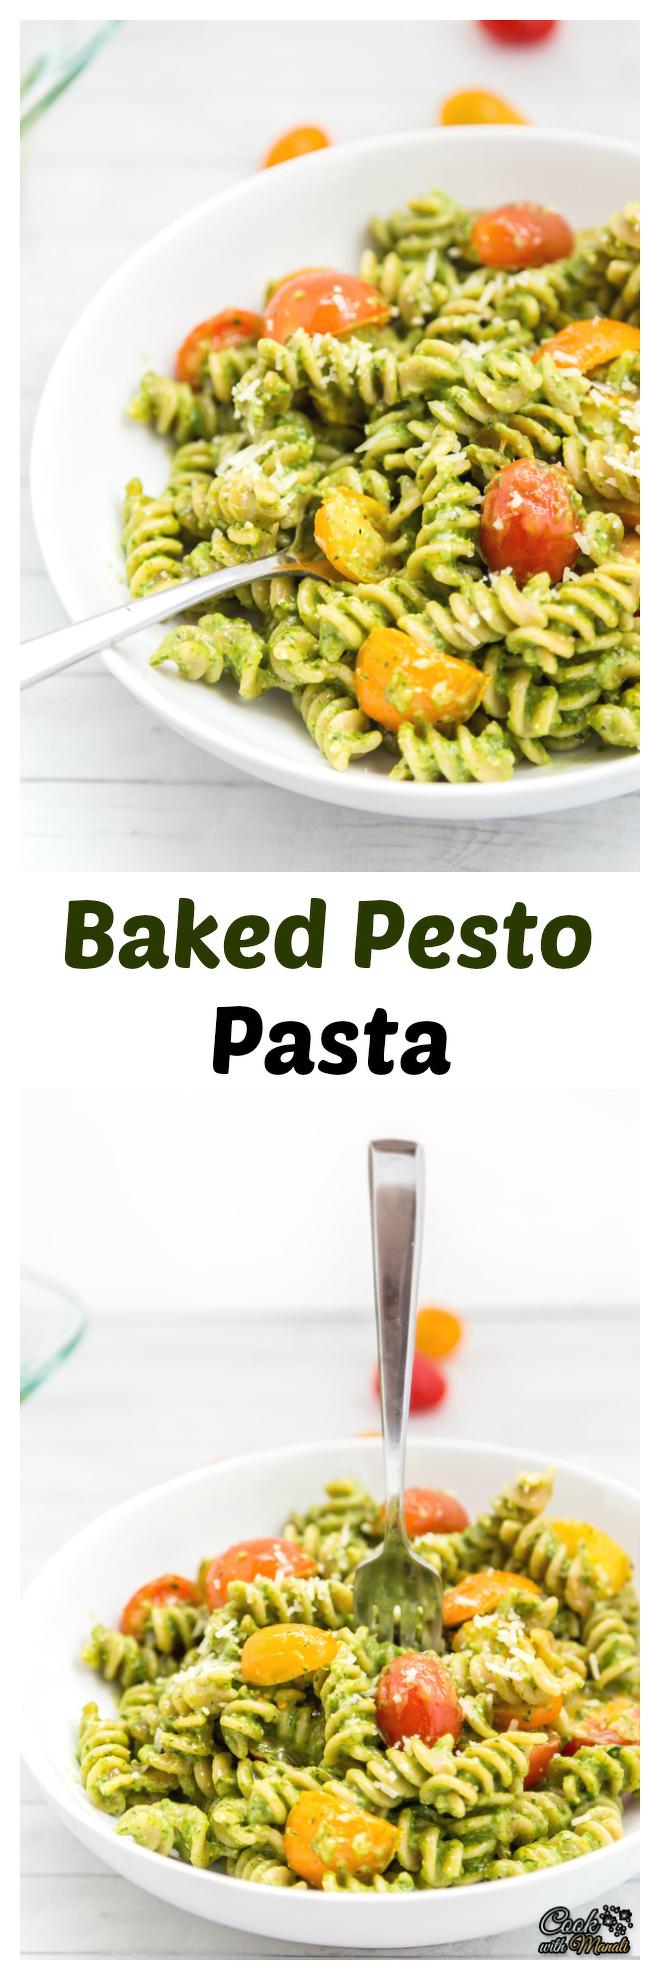 Baked Pesto Pasta Collage-nocwm